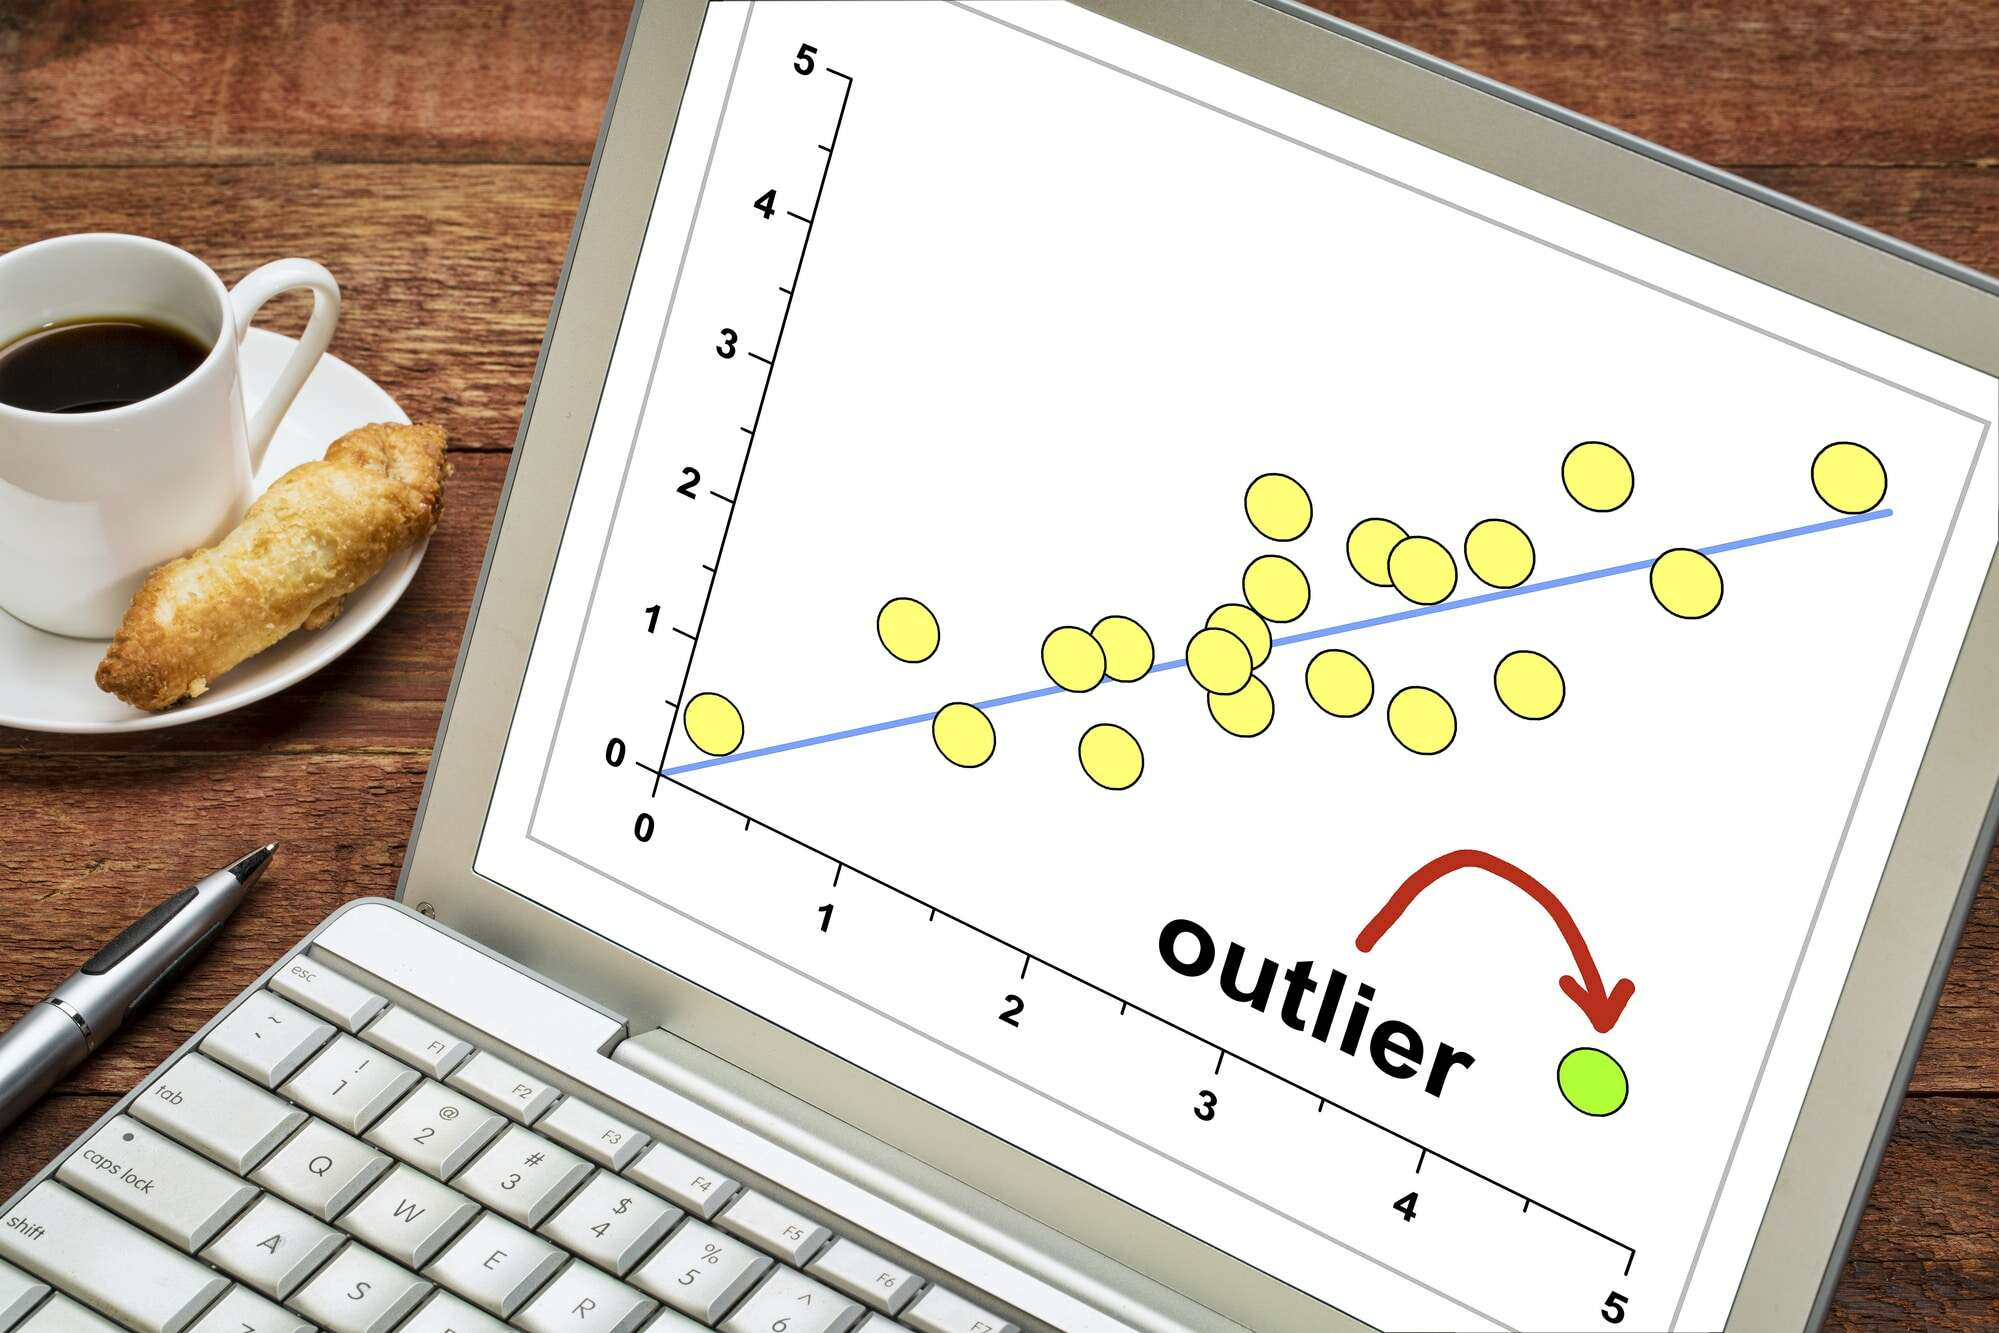 outlier-analysis-laptop